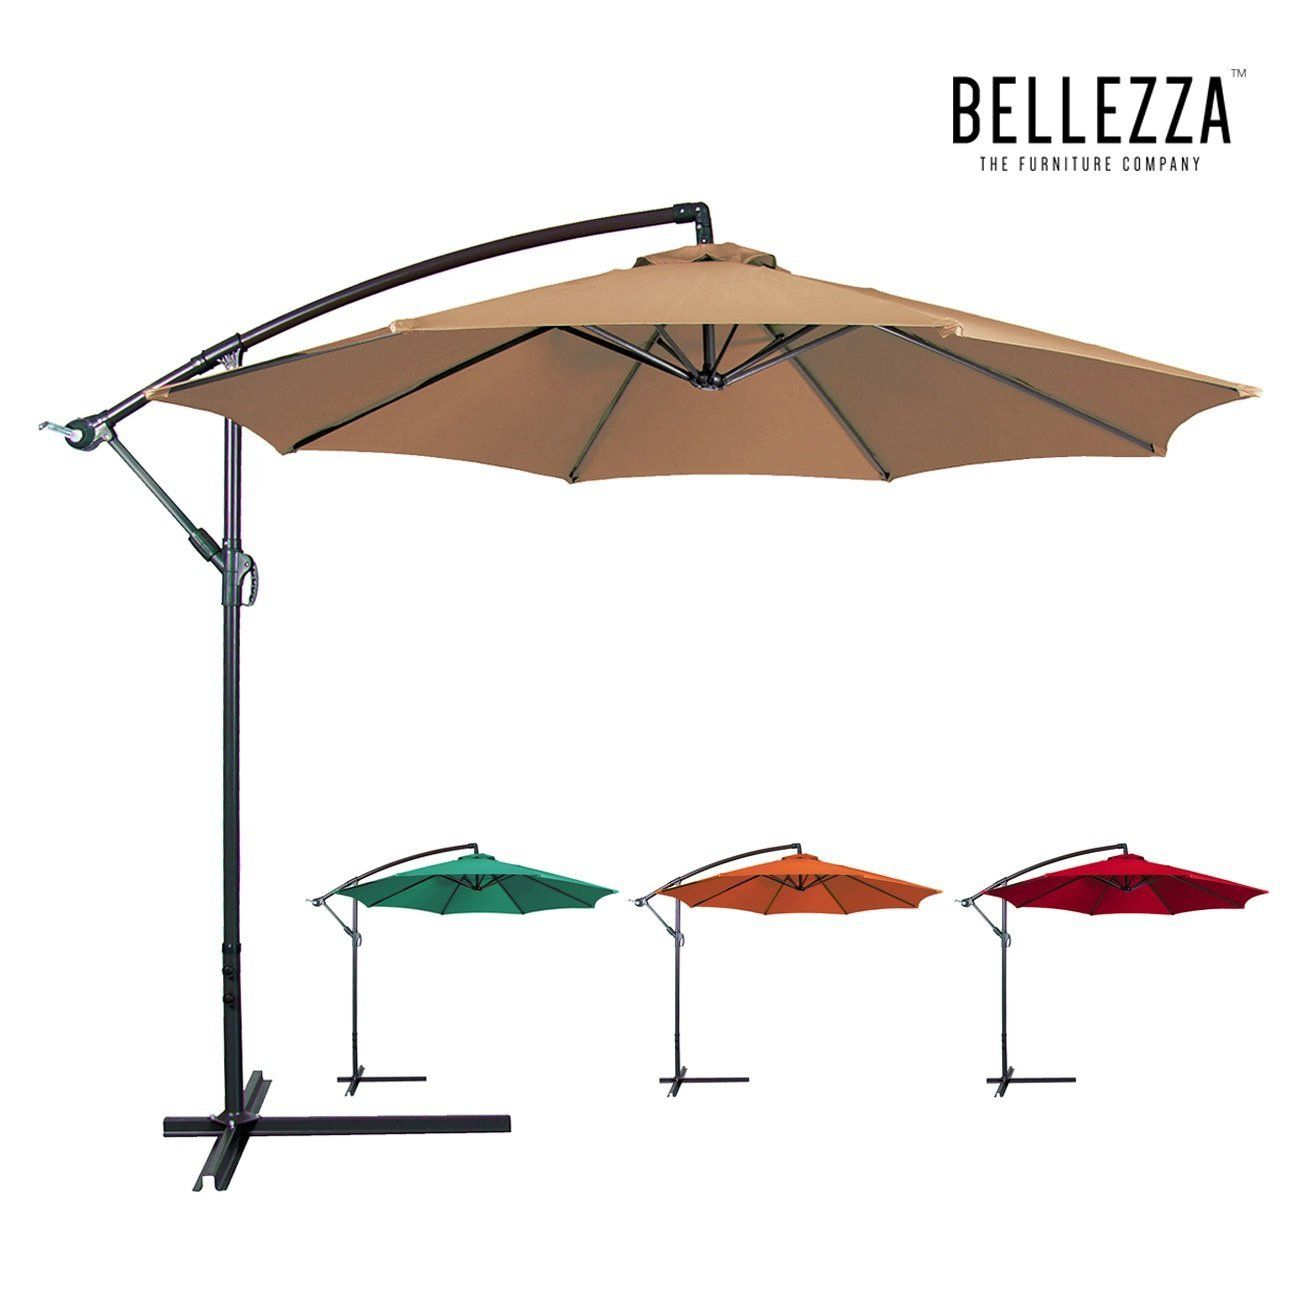 Amazon.com : Bellezza© Premium Patio Umbrella 10u0027 Feet Patio Tilt W/